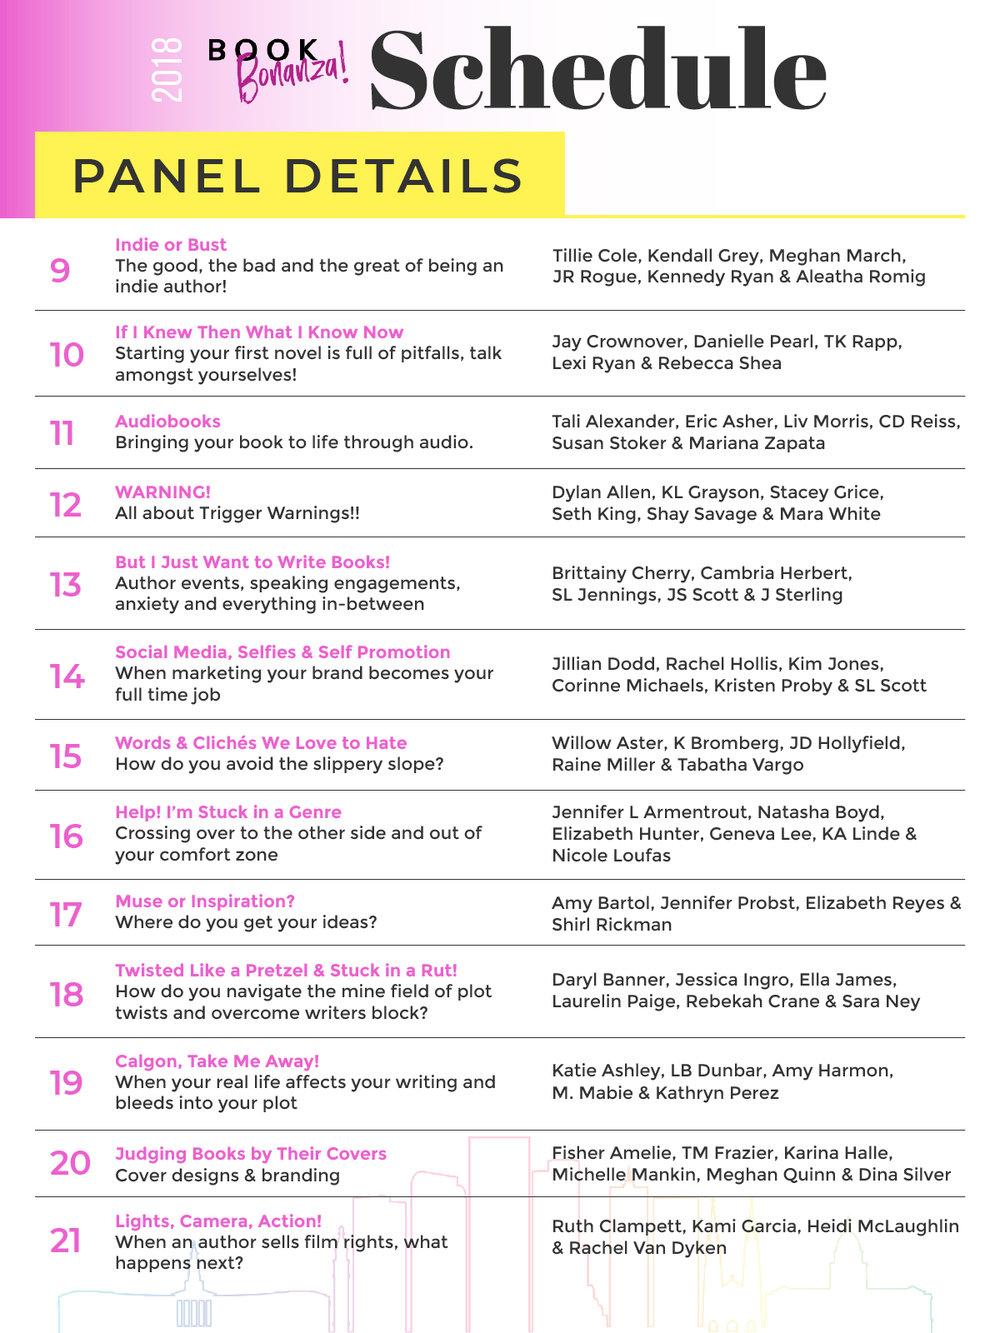 03 Book Bonanza 2018 Schedule Panel Details Contd (3).jpg